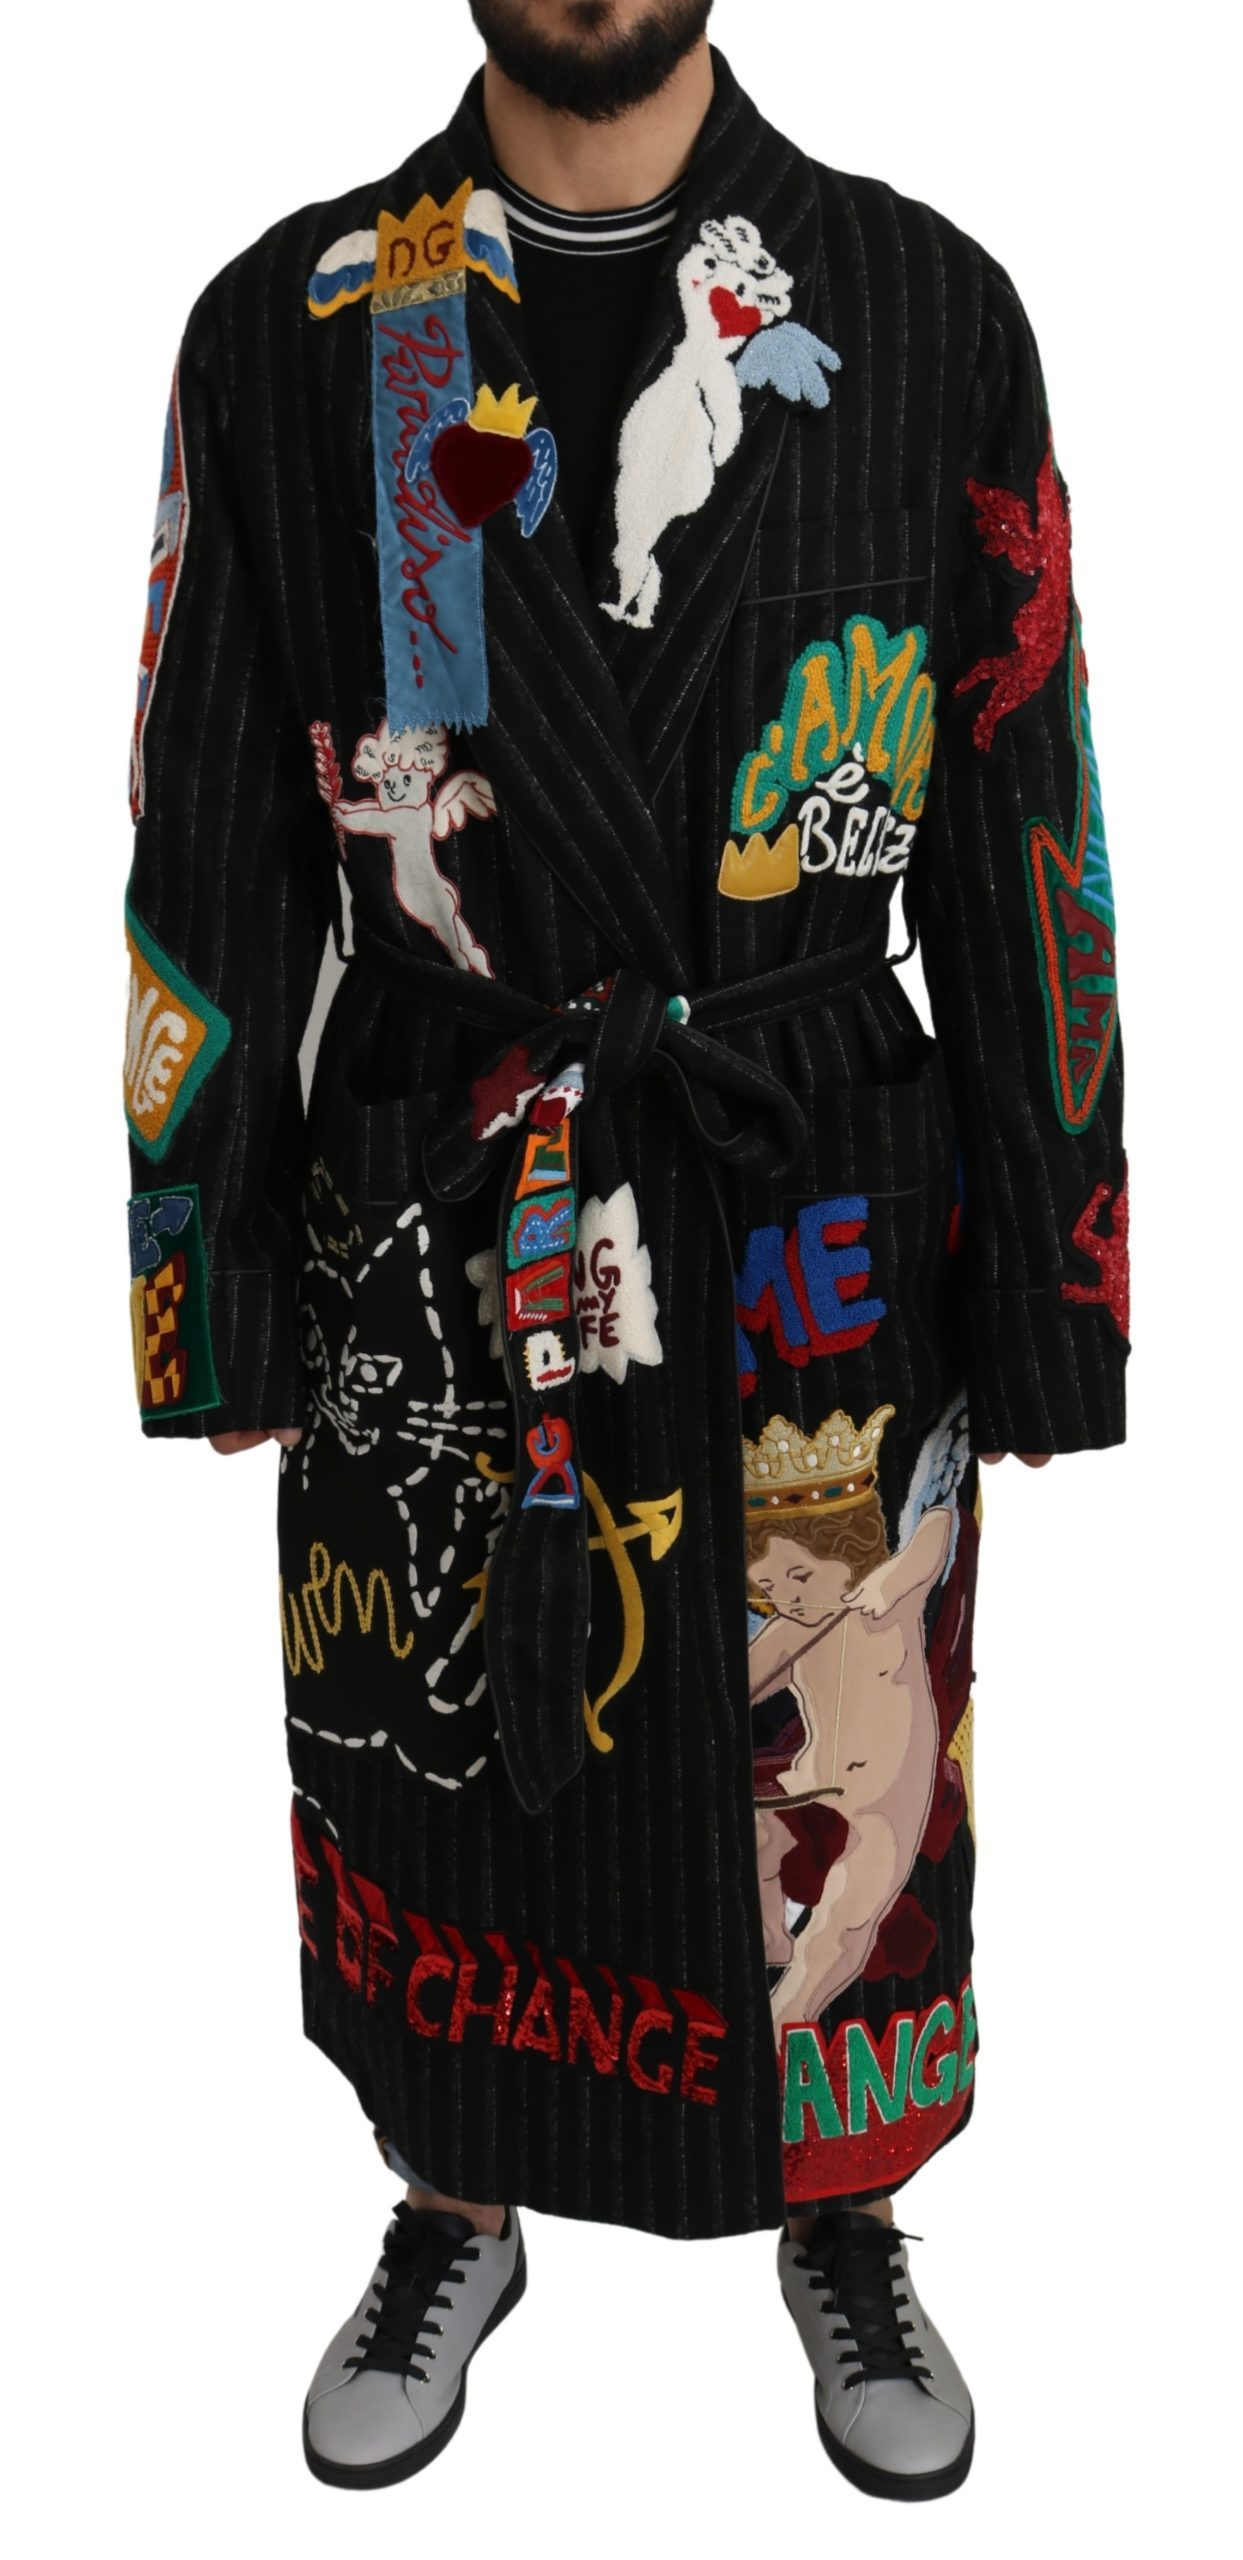 Dolce & Gabbana Men's Wool BELLEZZA Nightgown Robe Coat Black JKT2663 - IT56 | 3XL